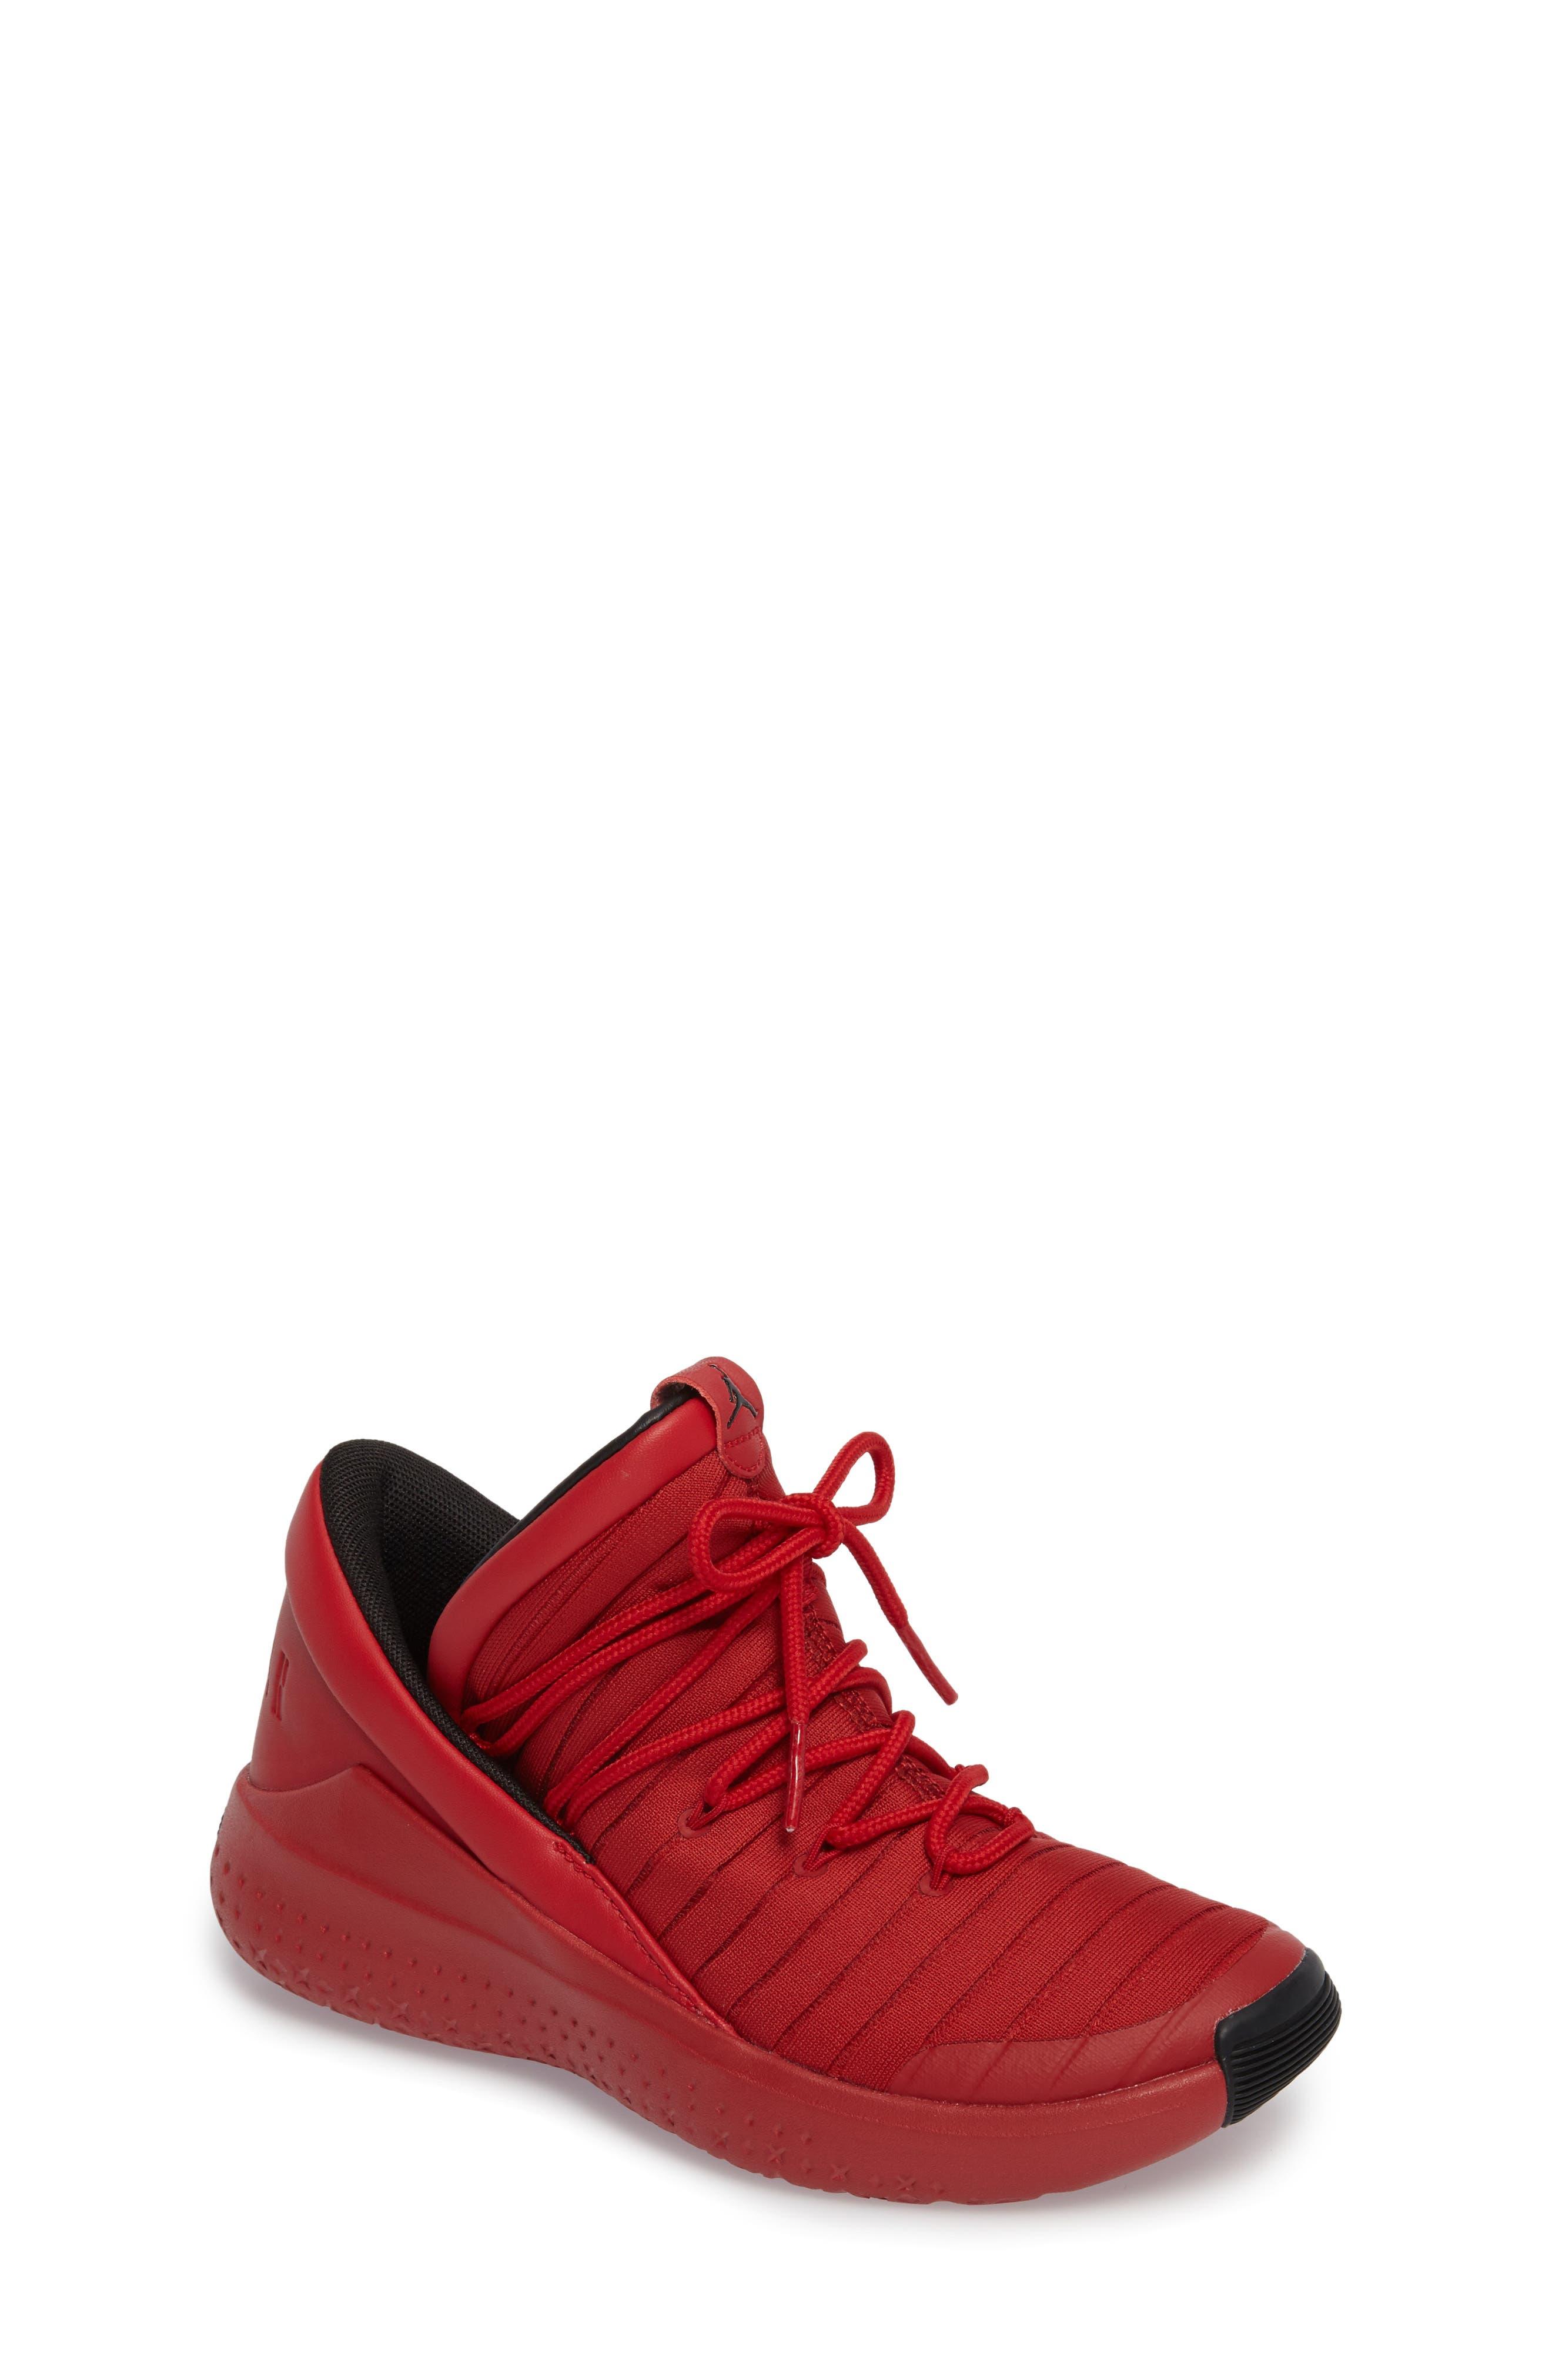 Nike Jordan Flight Luxe Sneaker (Big Kid)